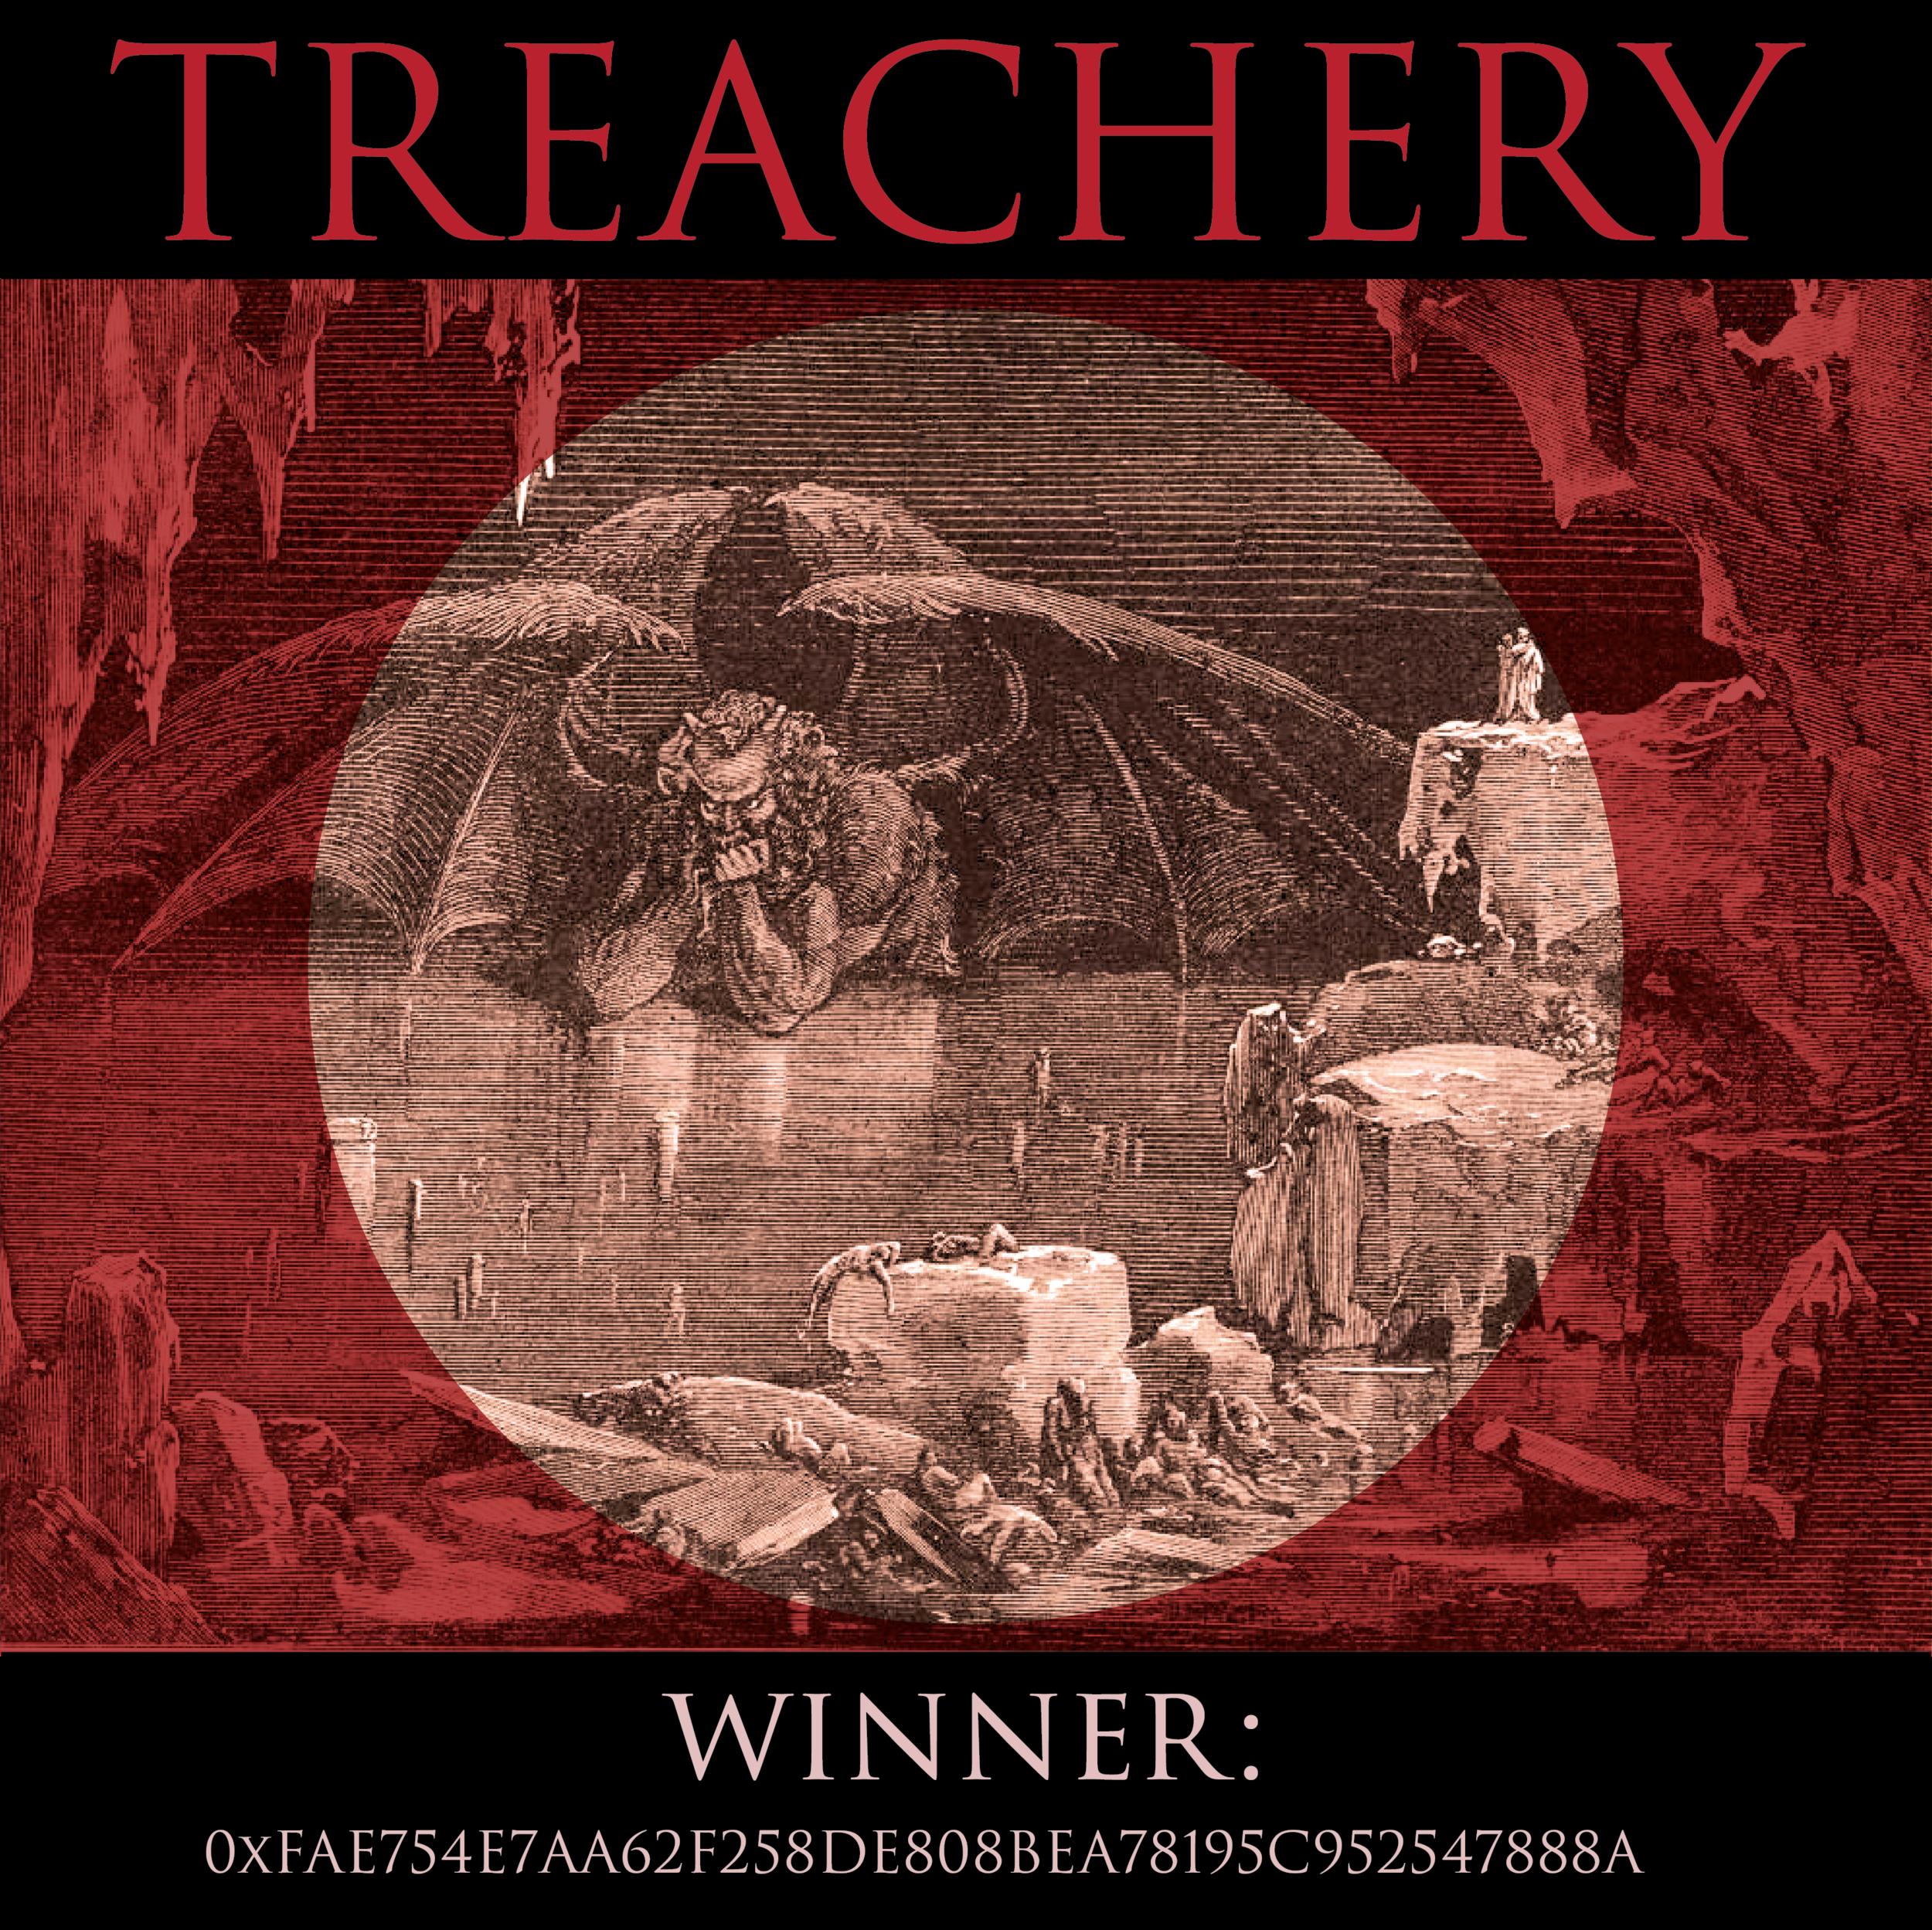 Treachery